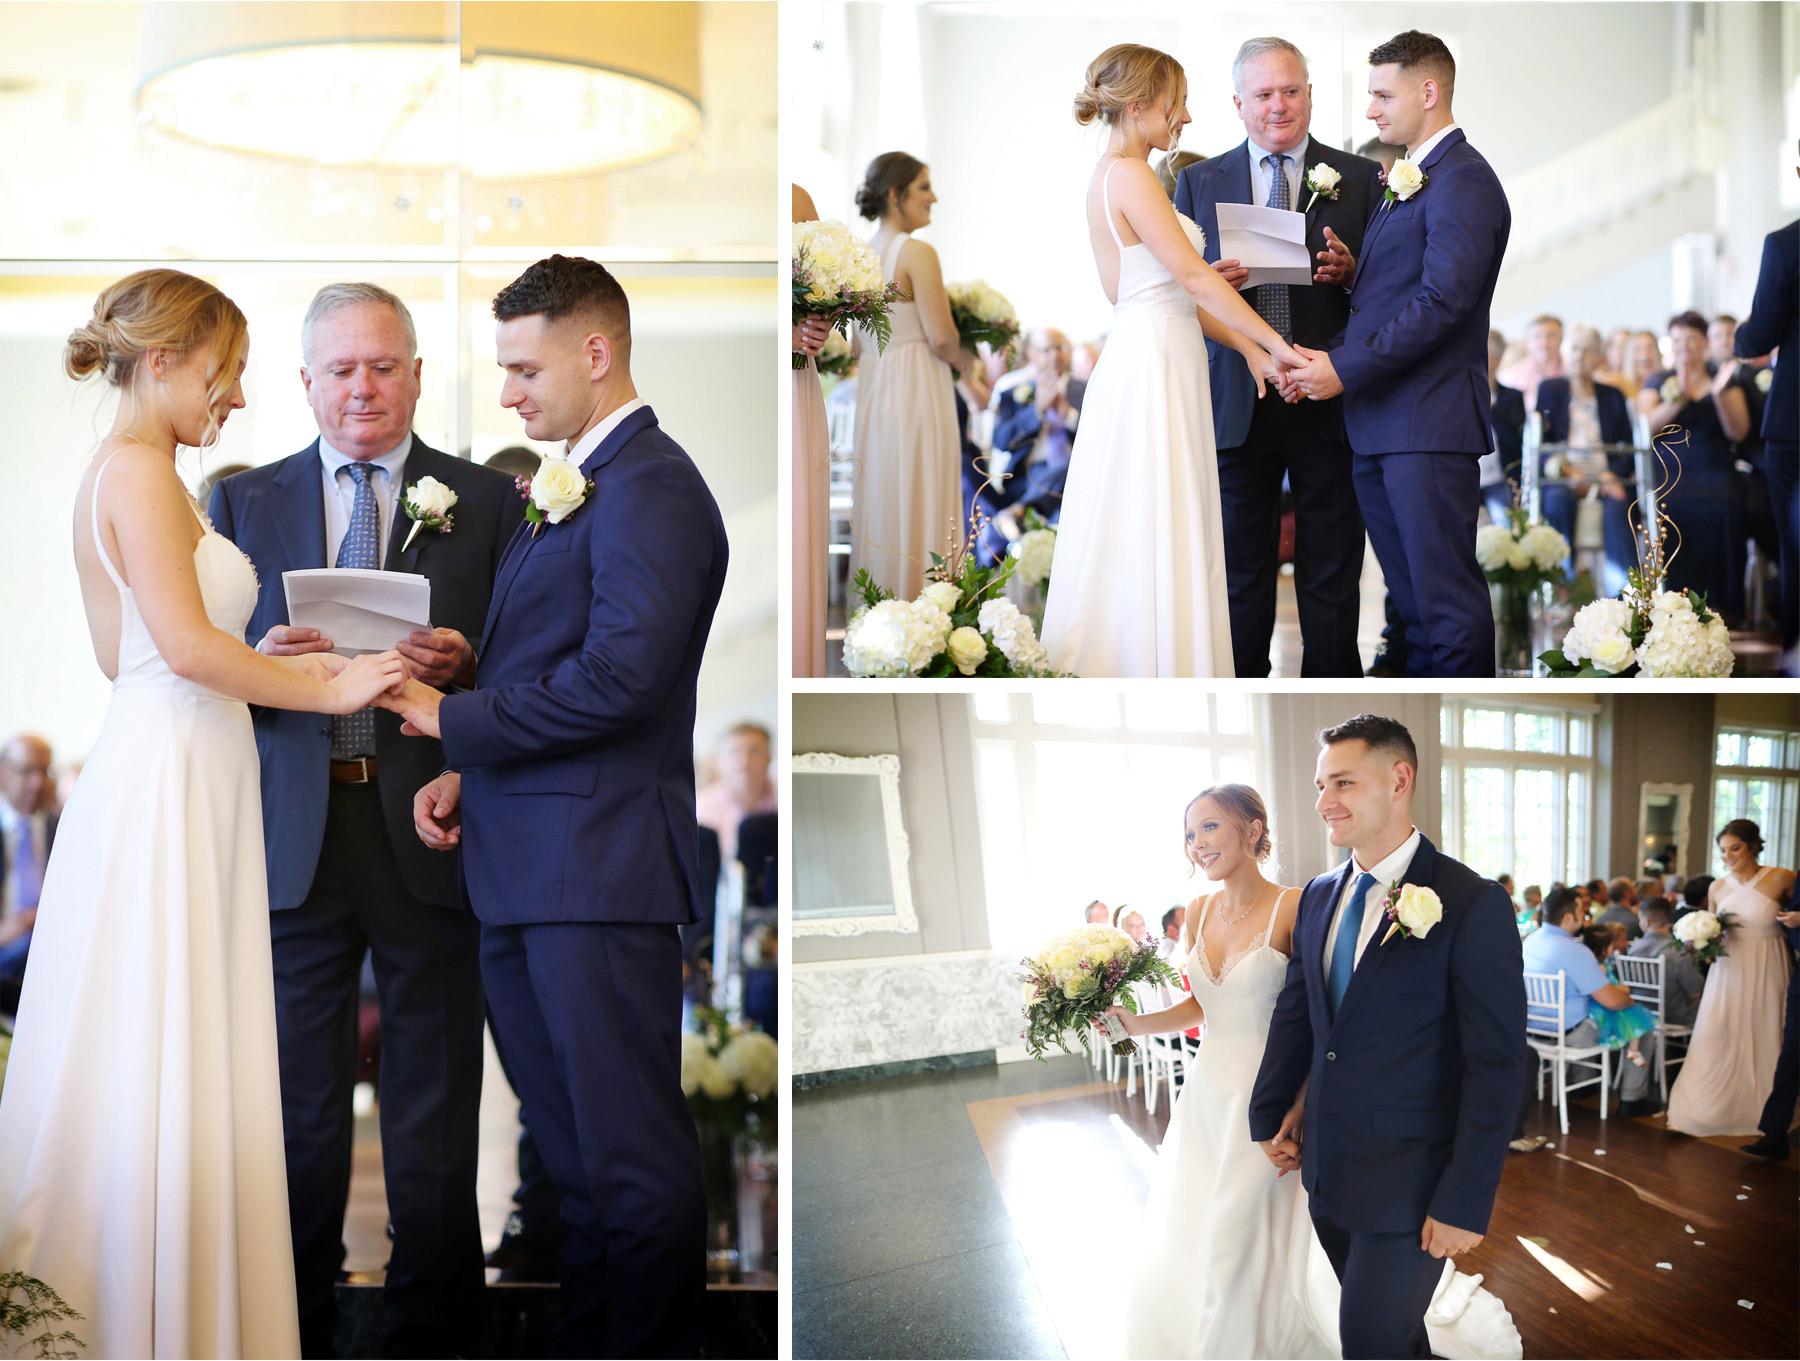 14-Minneapolis-Minnesota-Wedding-Andrew-Vick-Photography-Calhoun-Beach-Club-Ceremony-Samantha-and-Ryan.jpg